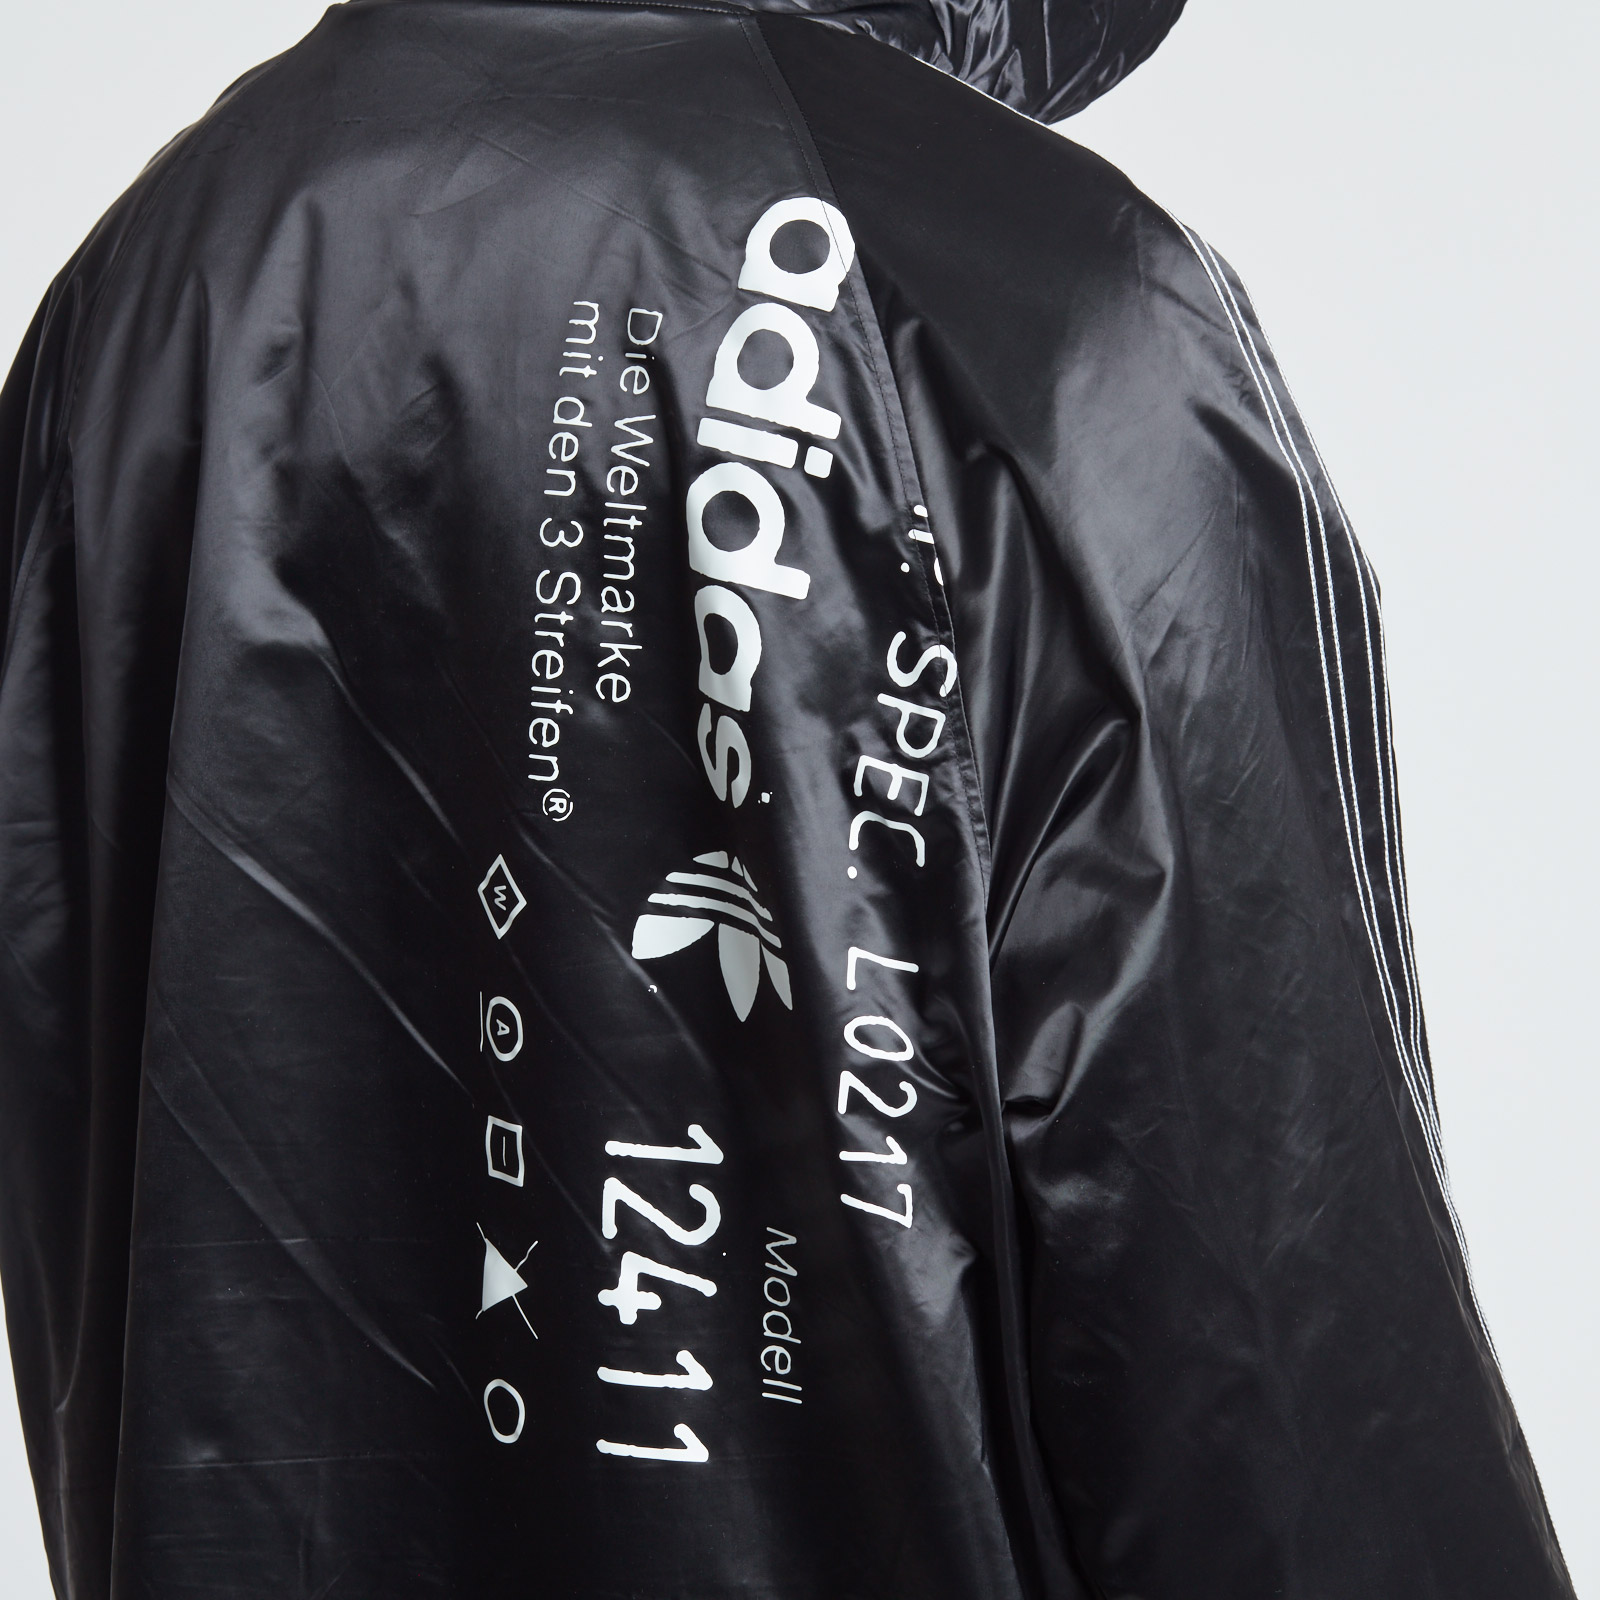 online store c0214 165e7 Adidas Stadium Jacket Cv5255 Sneakersnstuff Sneakers